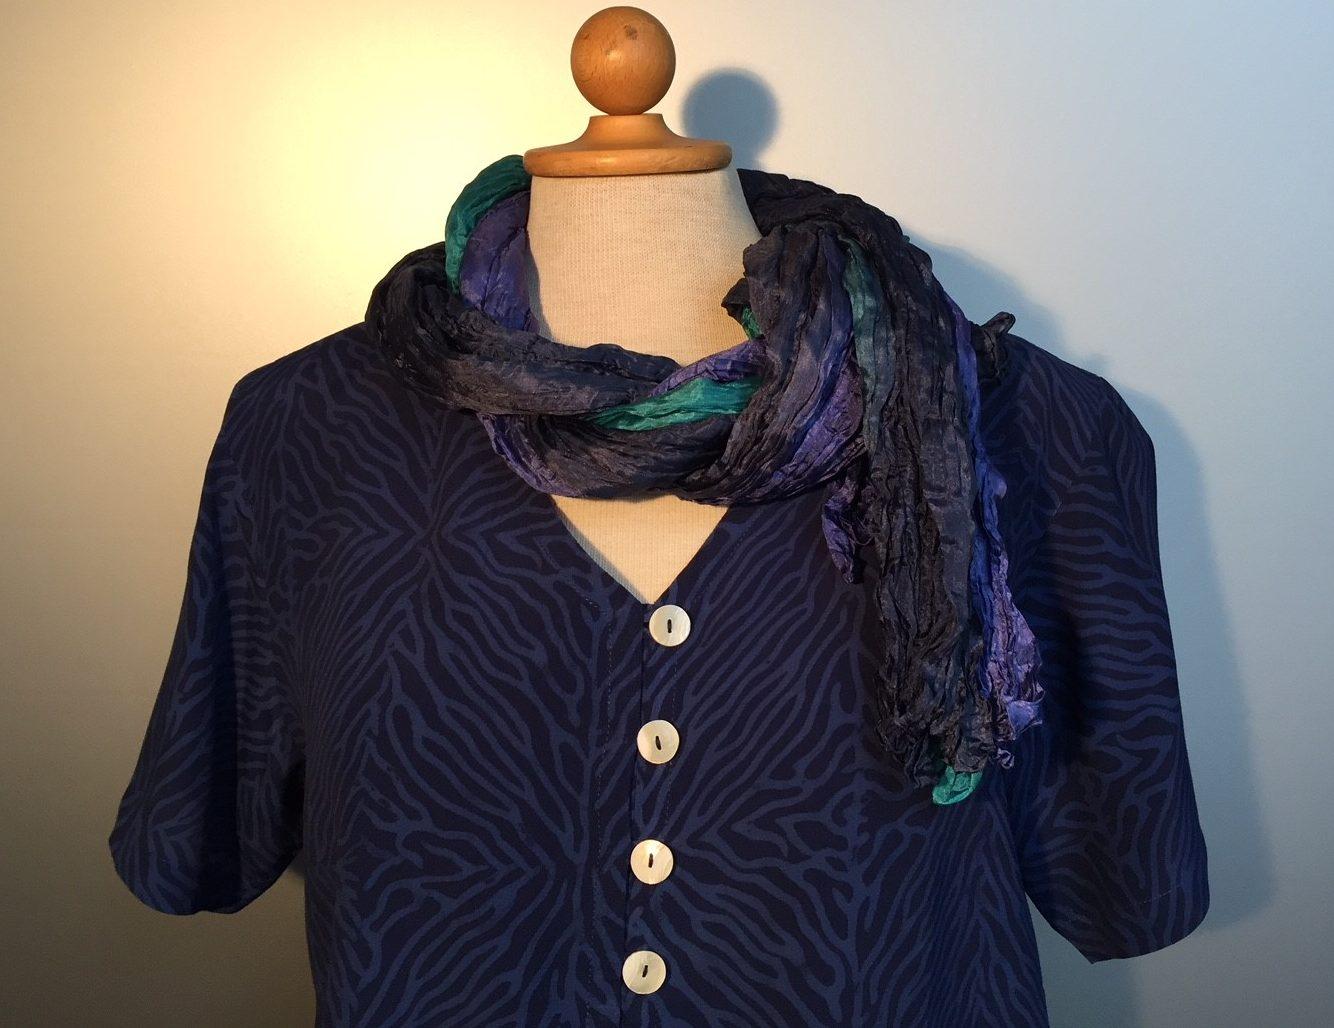 Batik bluse130 - Zebra mørkeblå, Store størrelser, kort bluse, knapper, perlemors knapper, kort ærme, øko, bæredygtigt, bio, holdbar, batik, batikfarvet, batiktryk, håndlavet, unik, unika, unikat, biti, ribe, kulørt, farver, lækker, åndbar, skjorte, skjortebluse, skjortejakke, figur, figursyet, timeglas, feminin, dame, pige, kvinder, specielt, kunsthåndværk, kunstnerisk, mørkeblå, marineblå, navy, navyblå, midnatsblå, blå, dyb blå